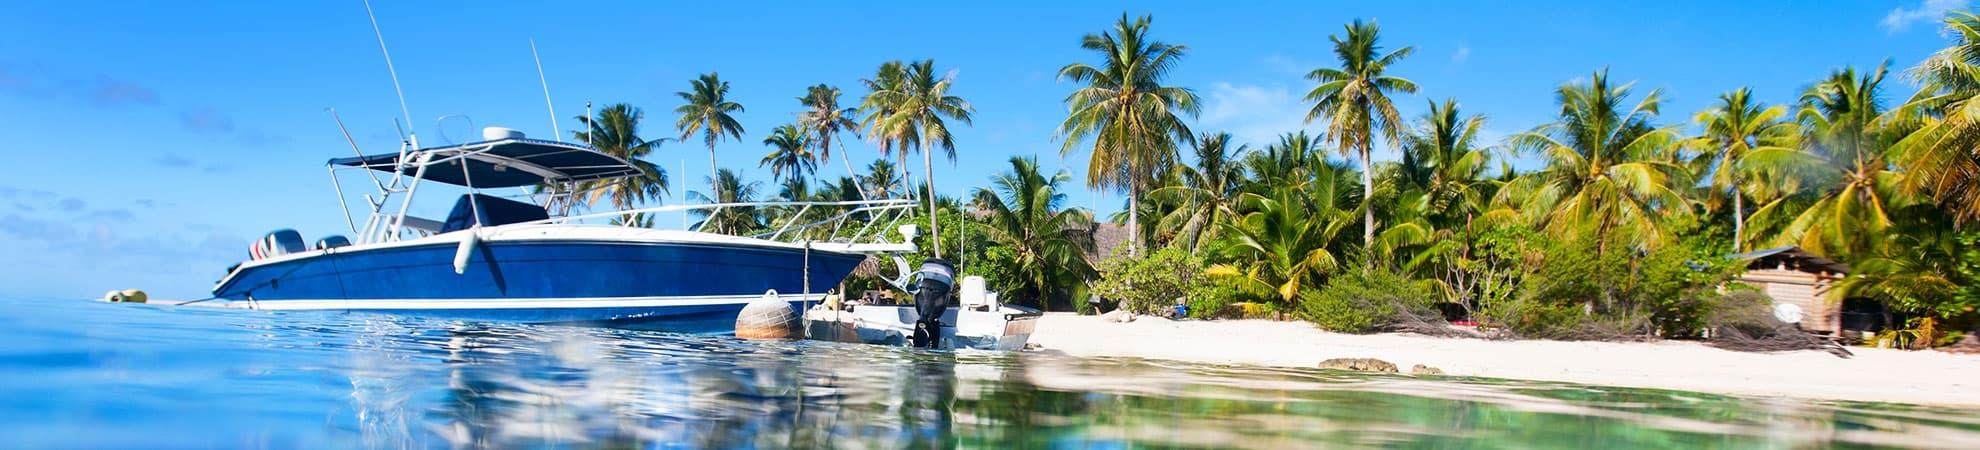 Voyage L'archipel des Tuamotu